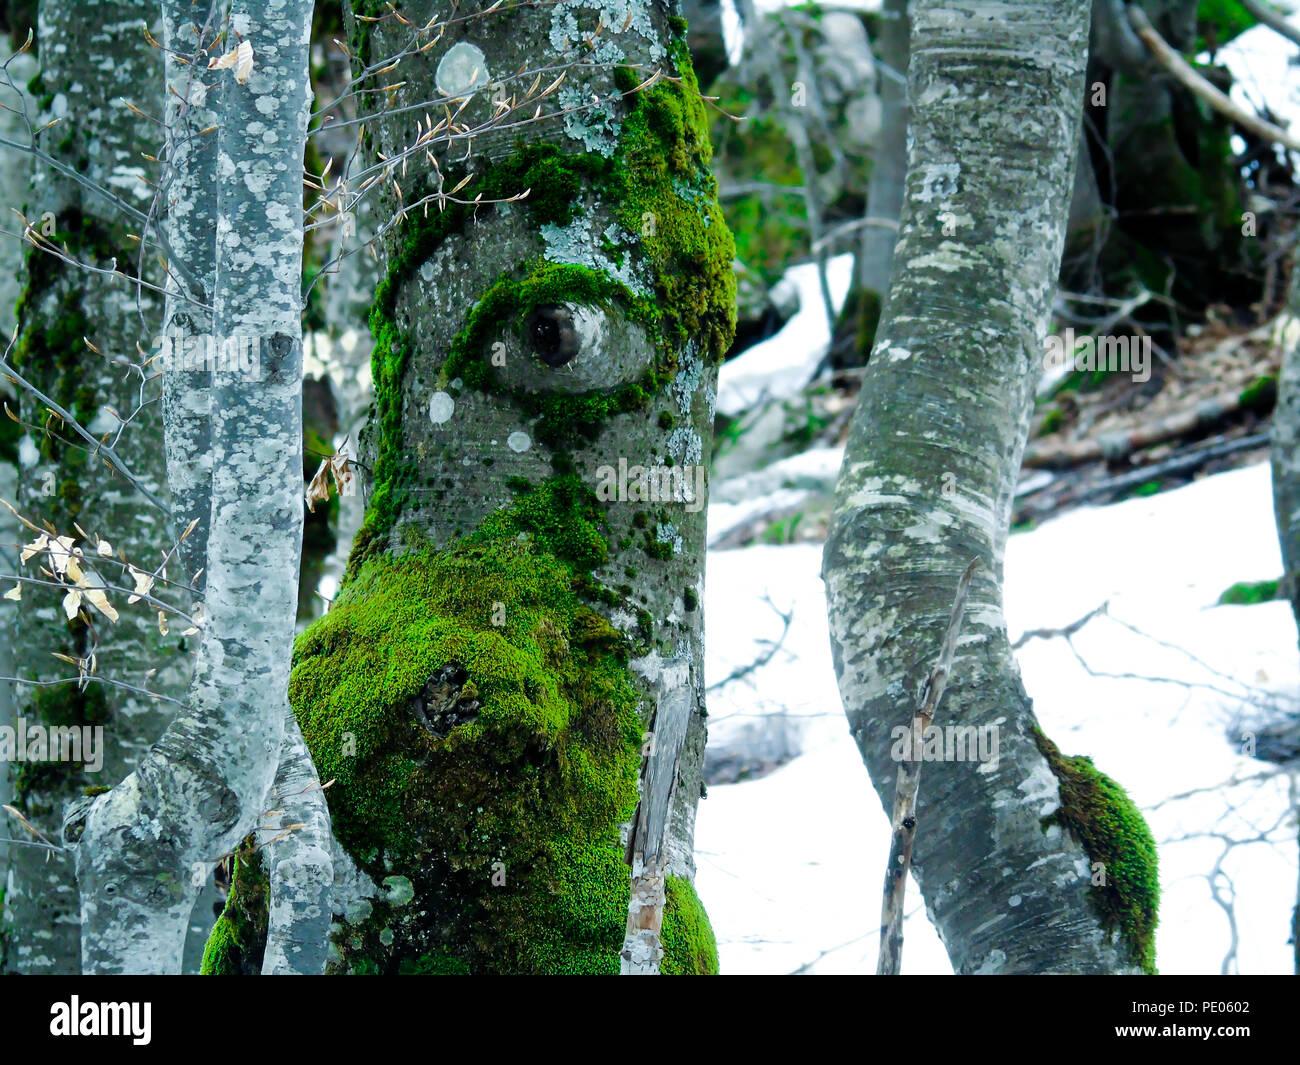 Auge form Baum ... wunderbare Natur! Stockbild